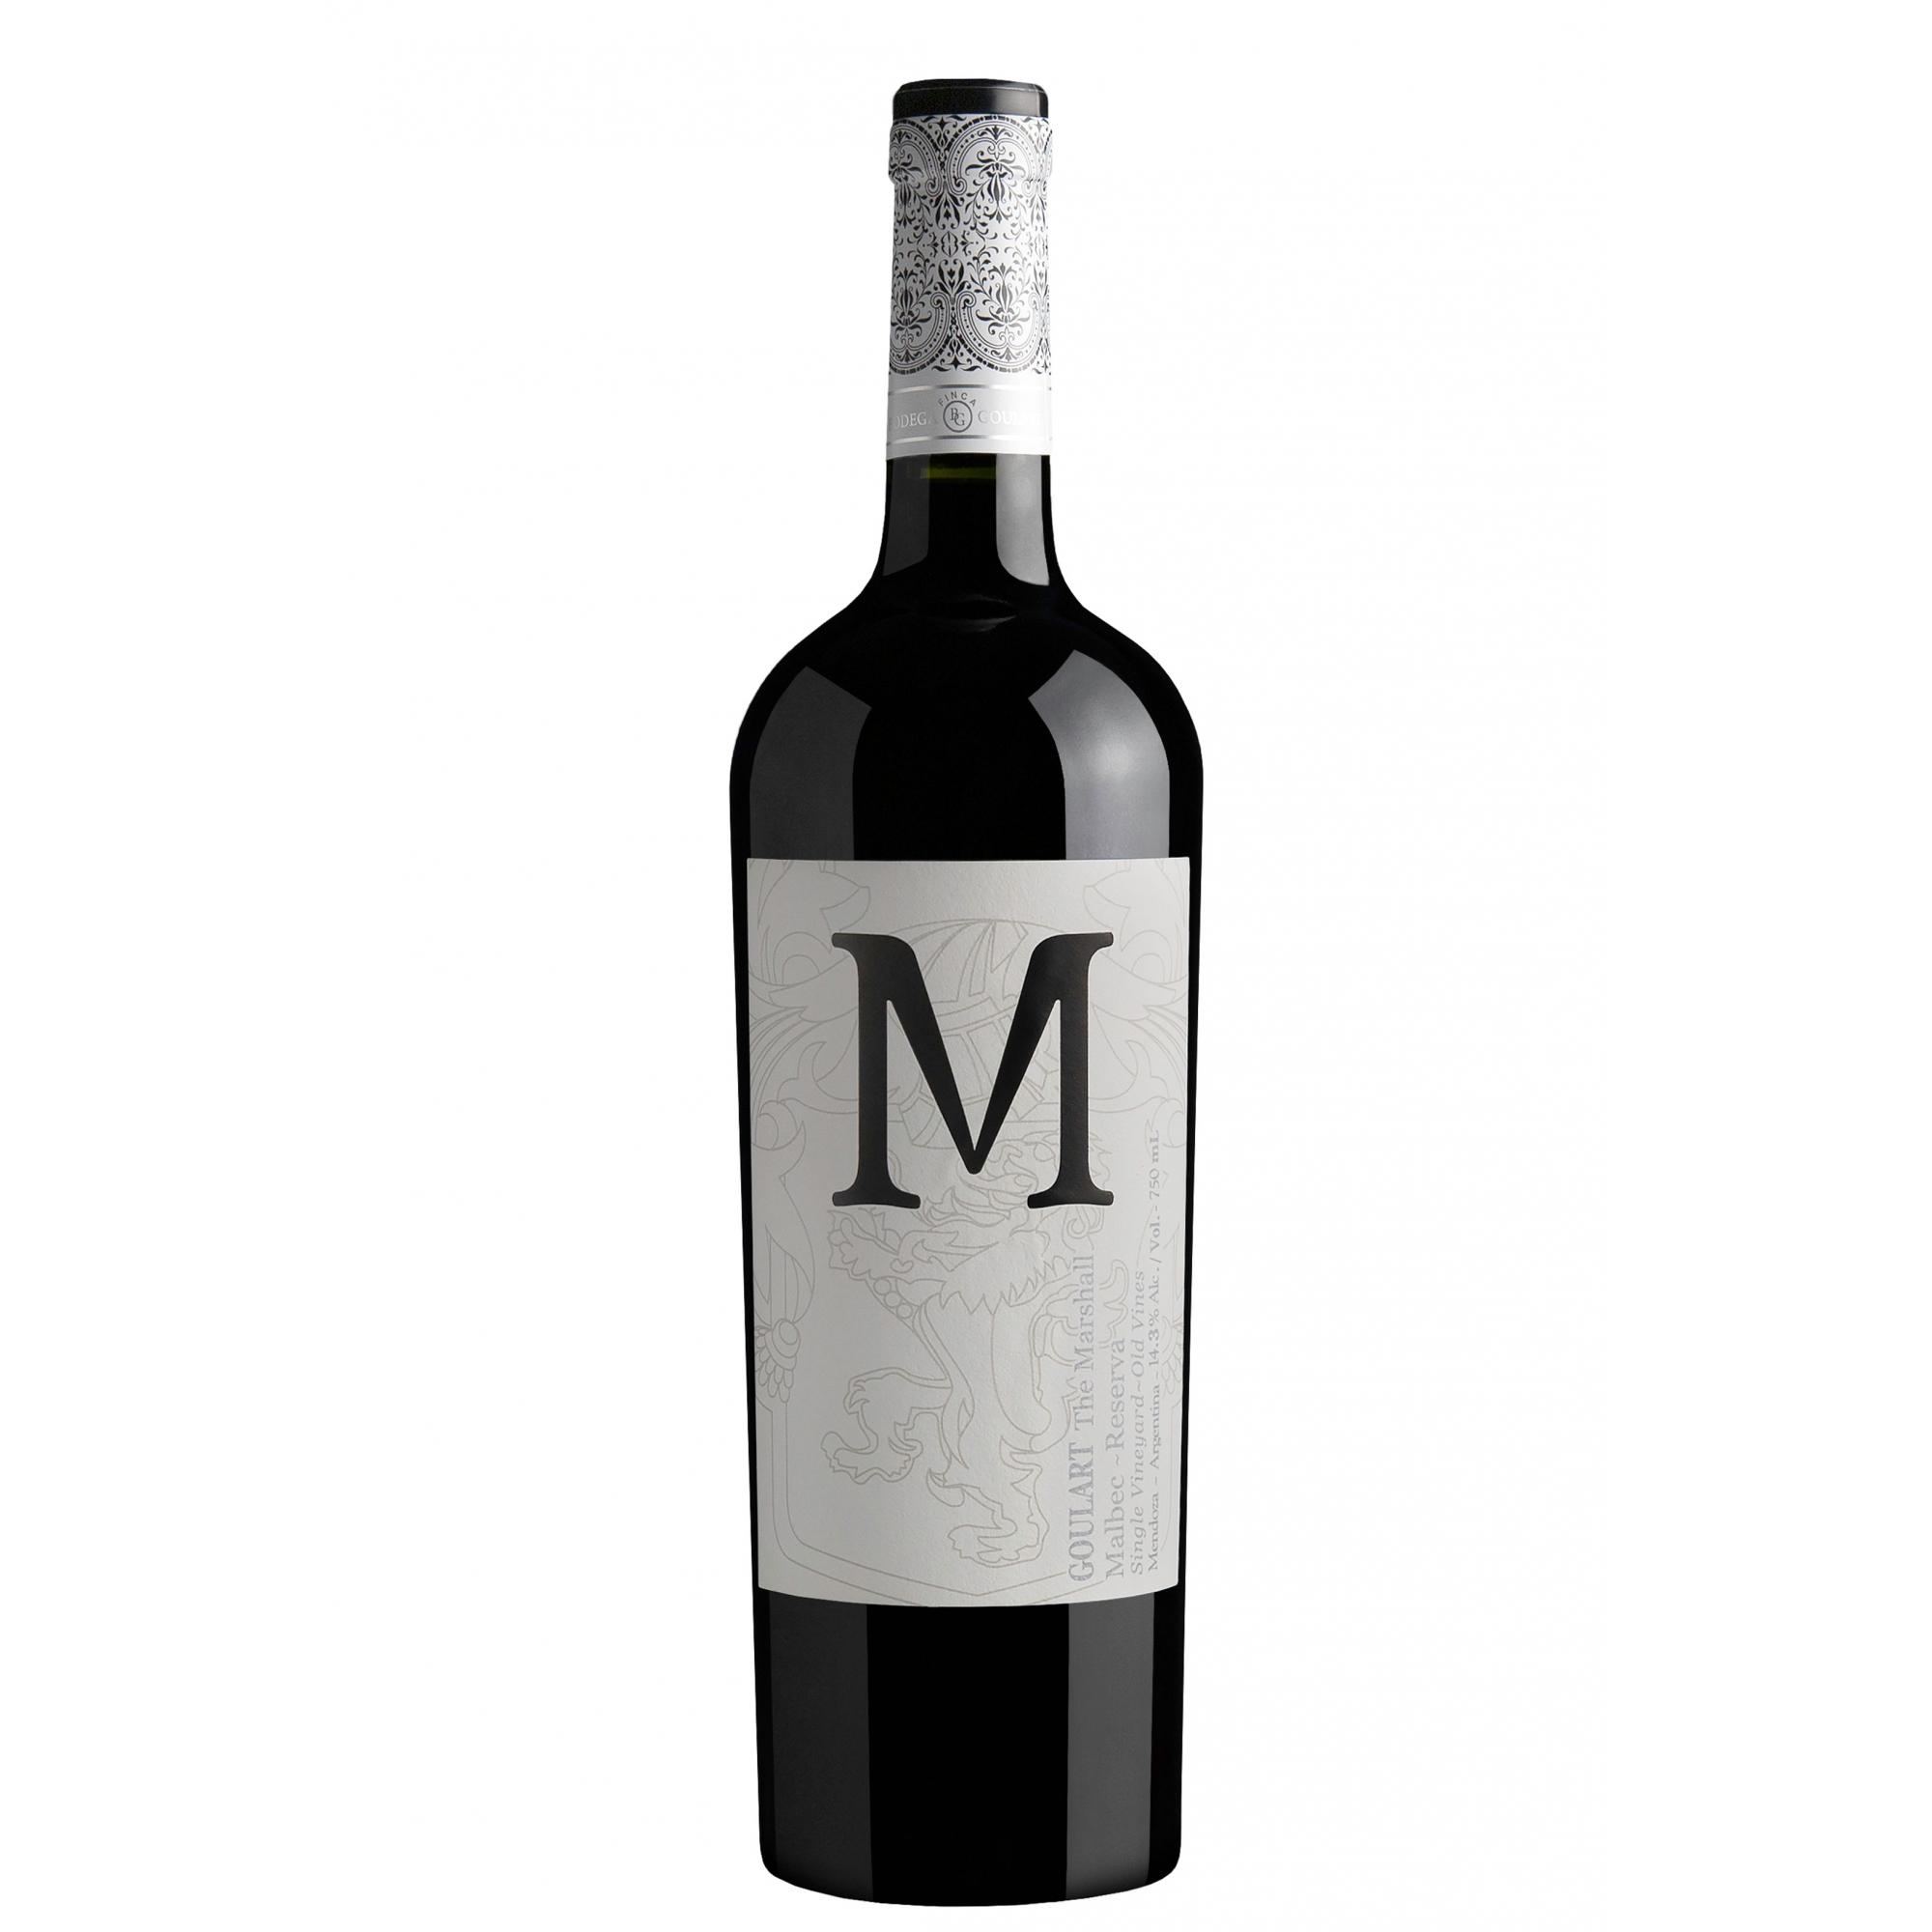 Goulart M The Marshall Single Vineyard  Malbec 2017 - 3.9 Vivino